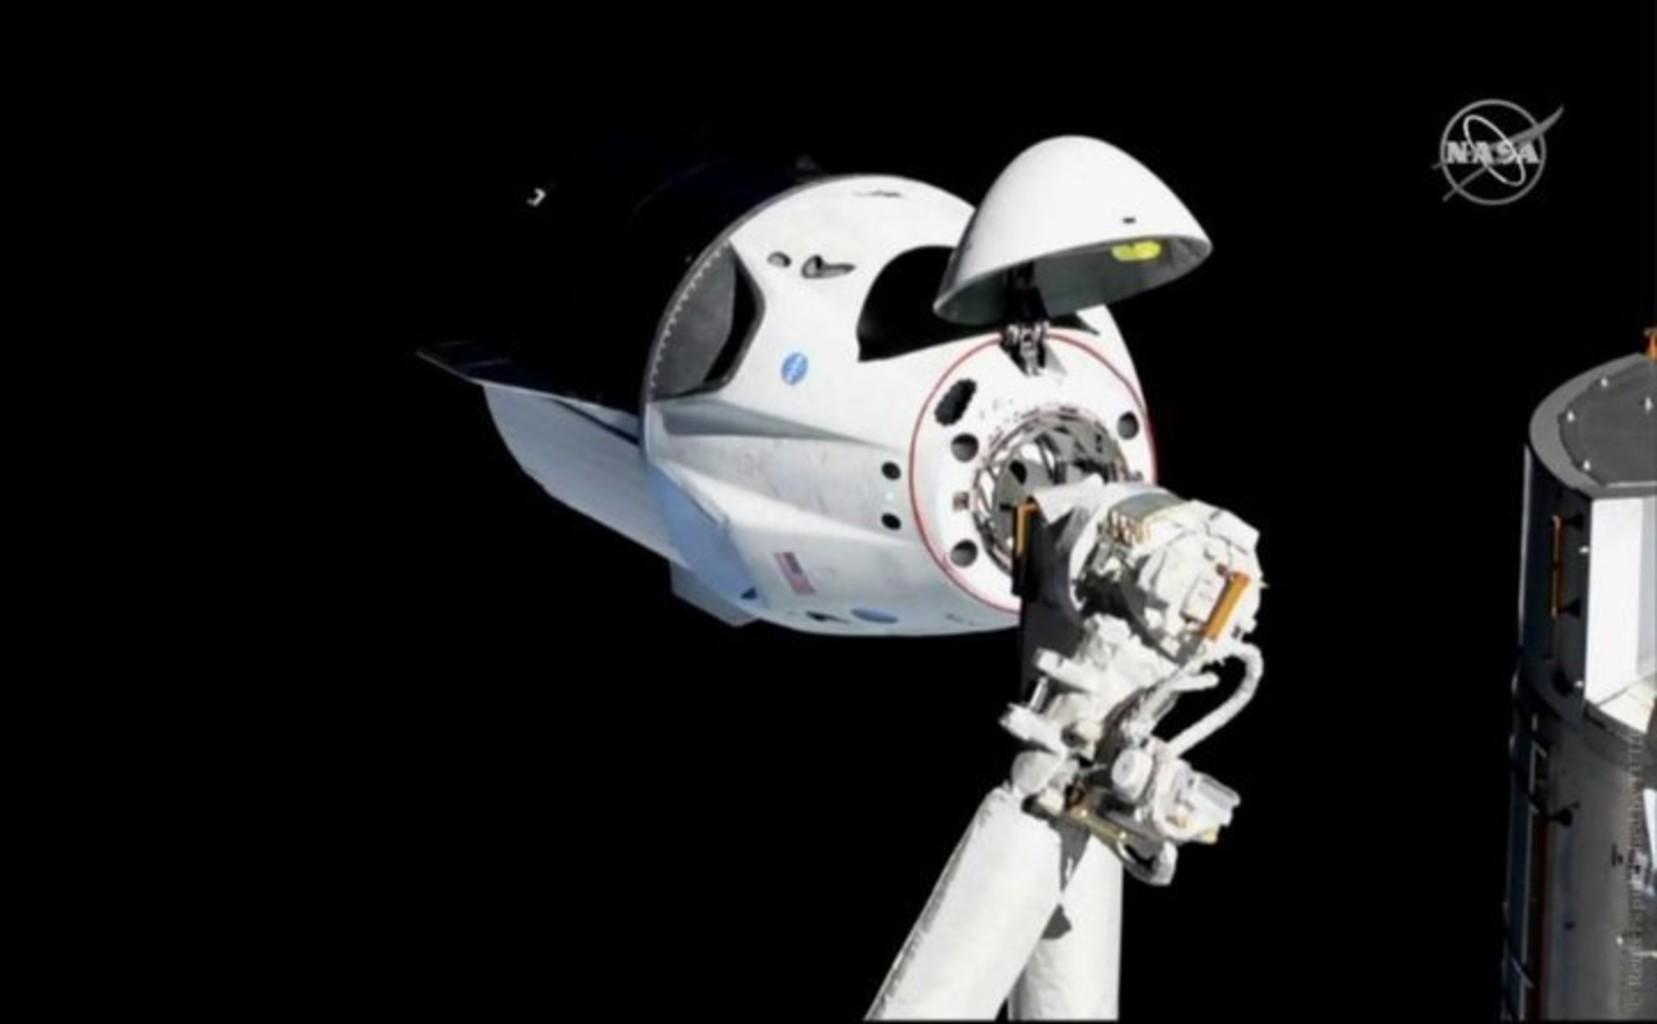 Капсула Сrew Dragon (Фото: NASA / Reuters)